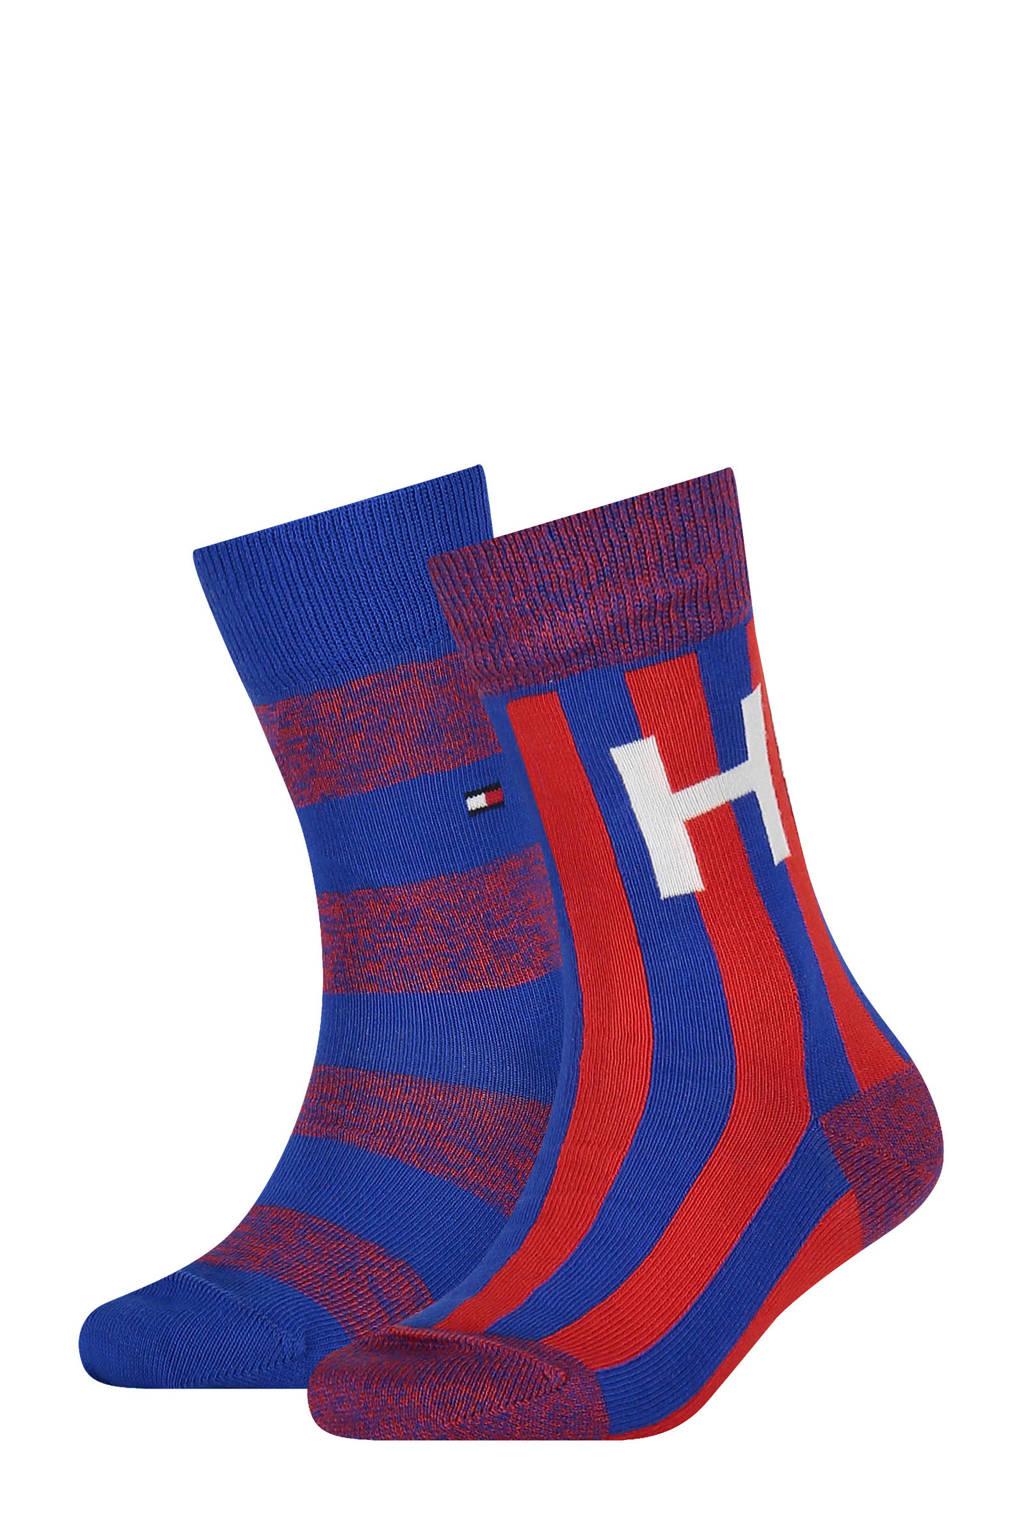 Tommy Hilfiger sokken - set van 2 blauw/rood, Blauw/rood